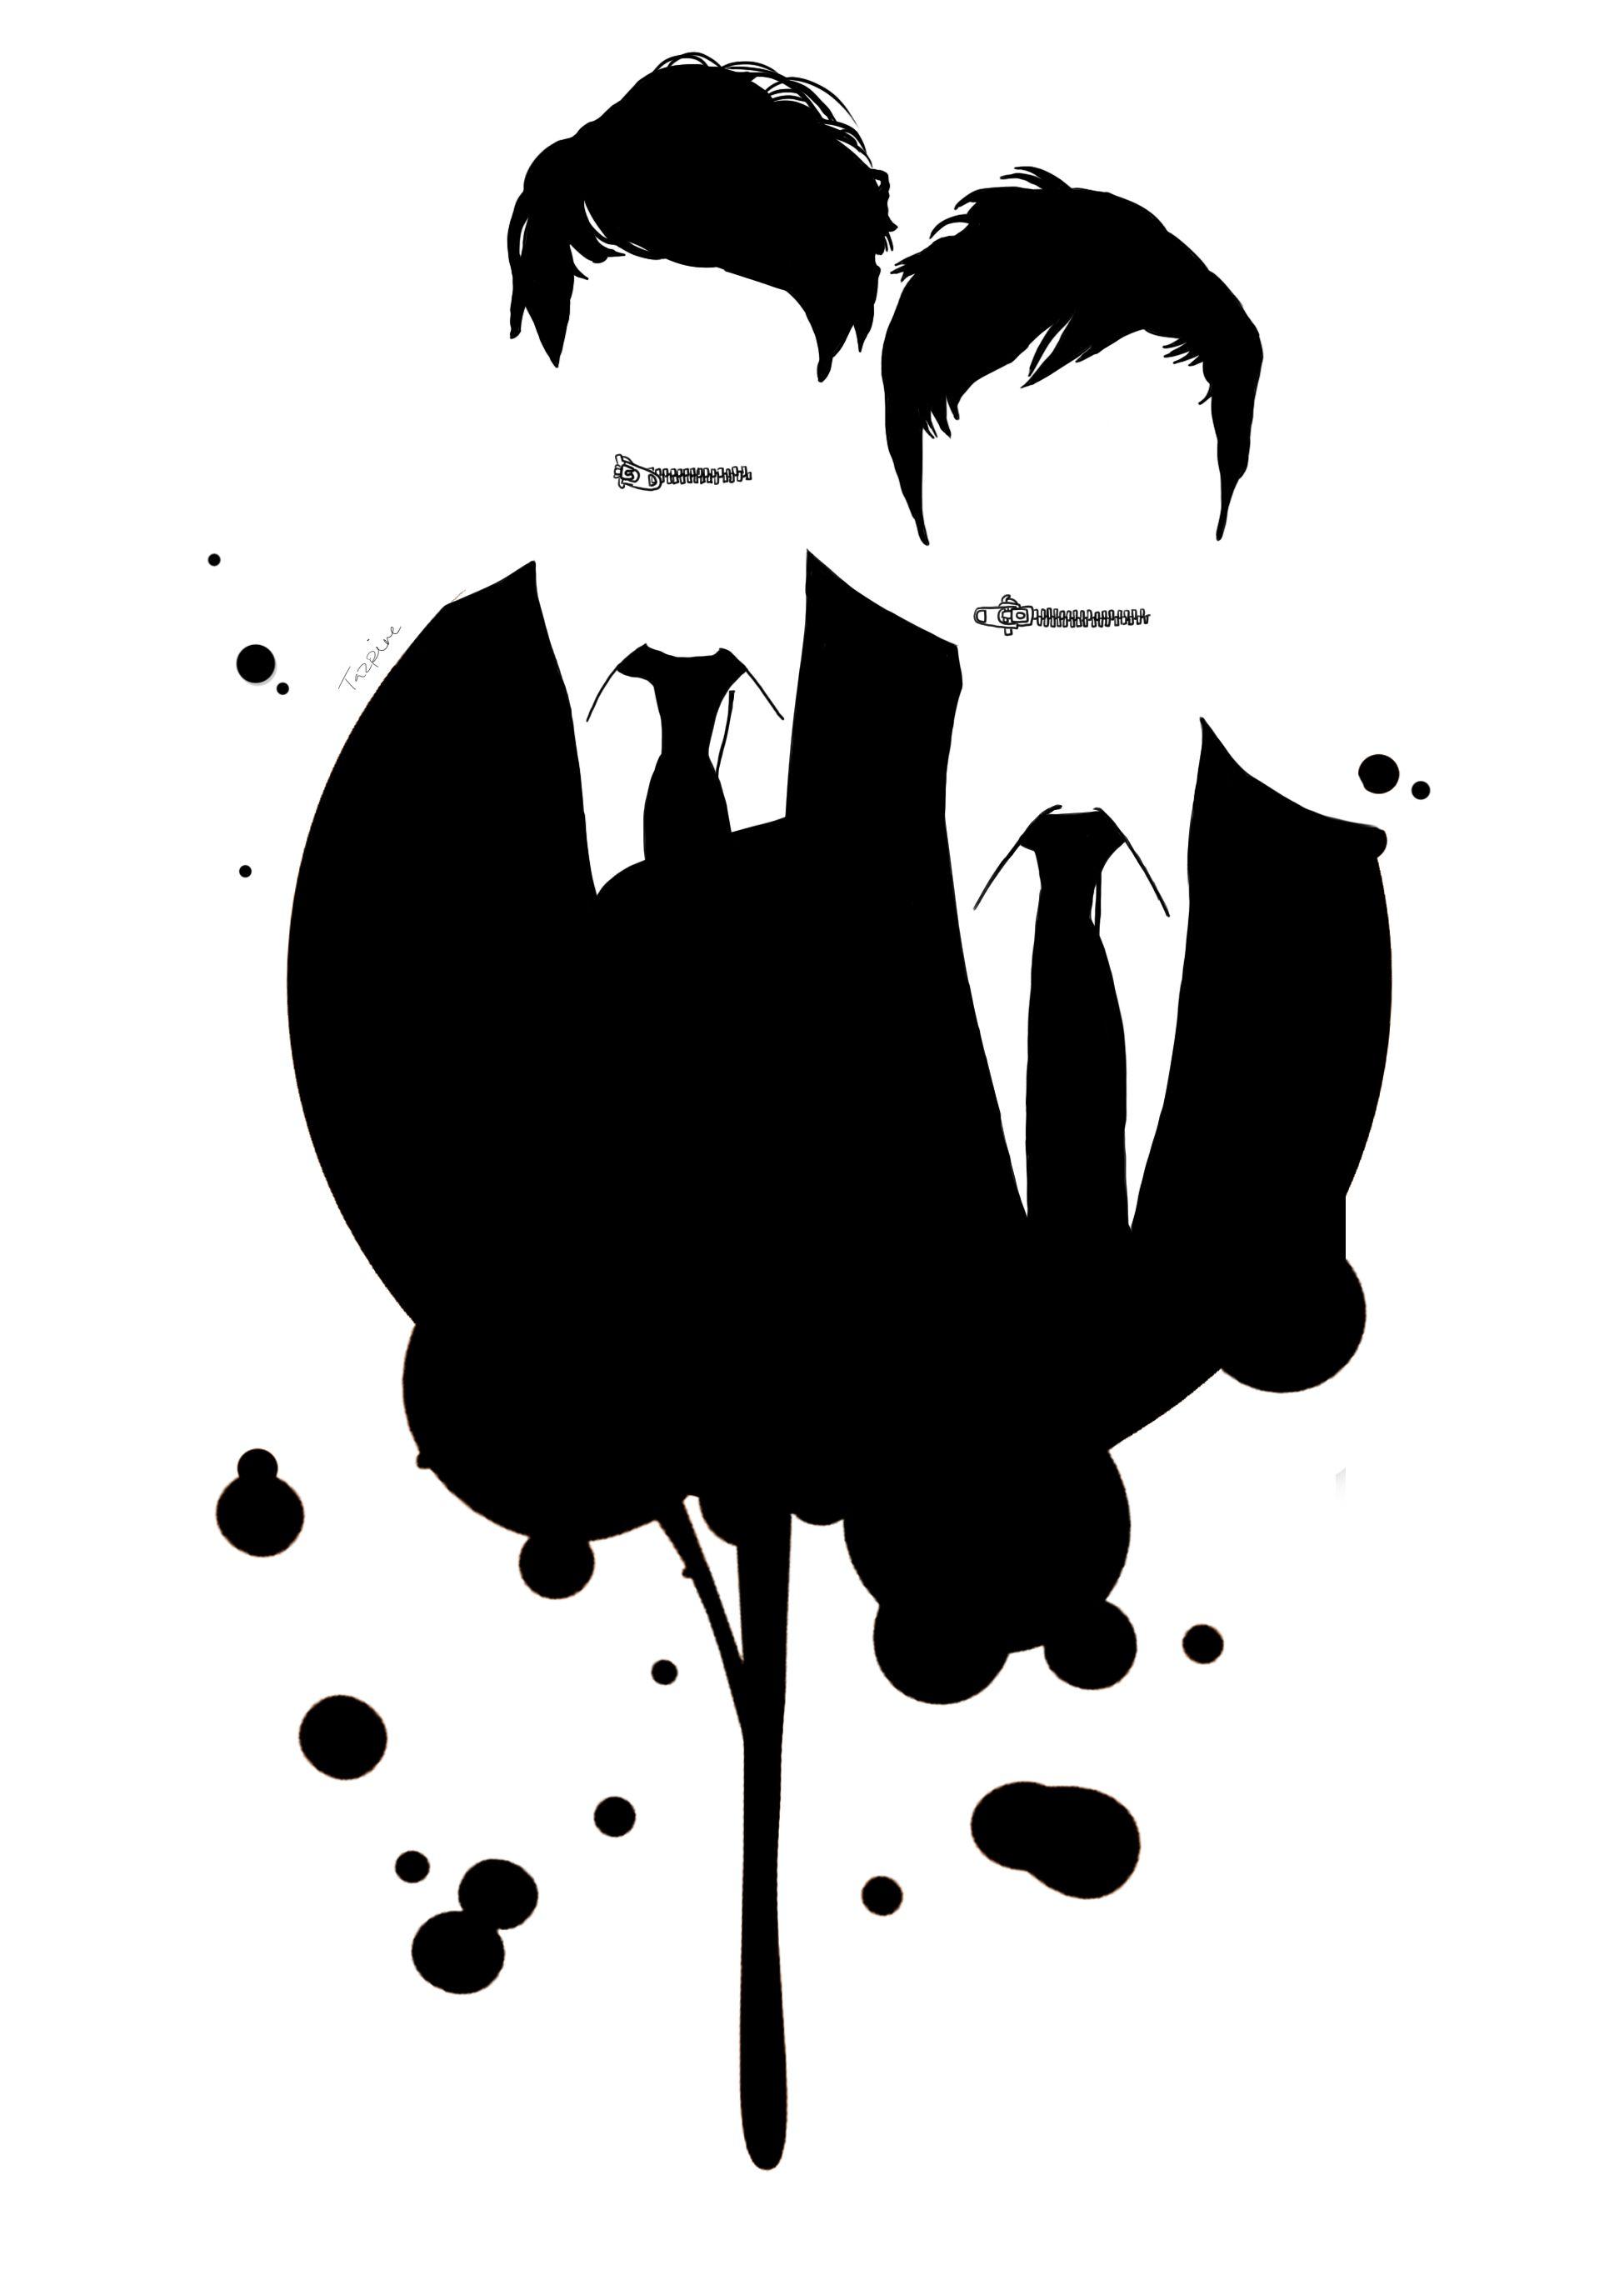 Barry and Stuart: Splat